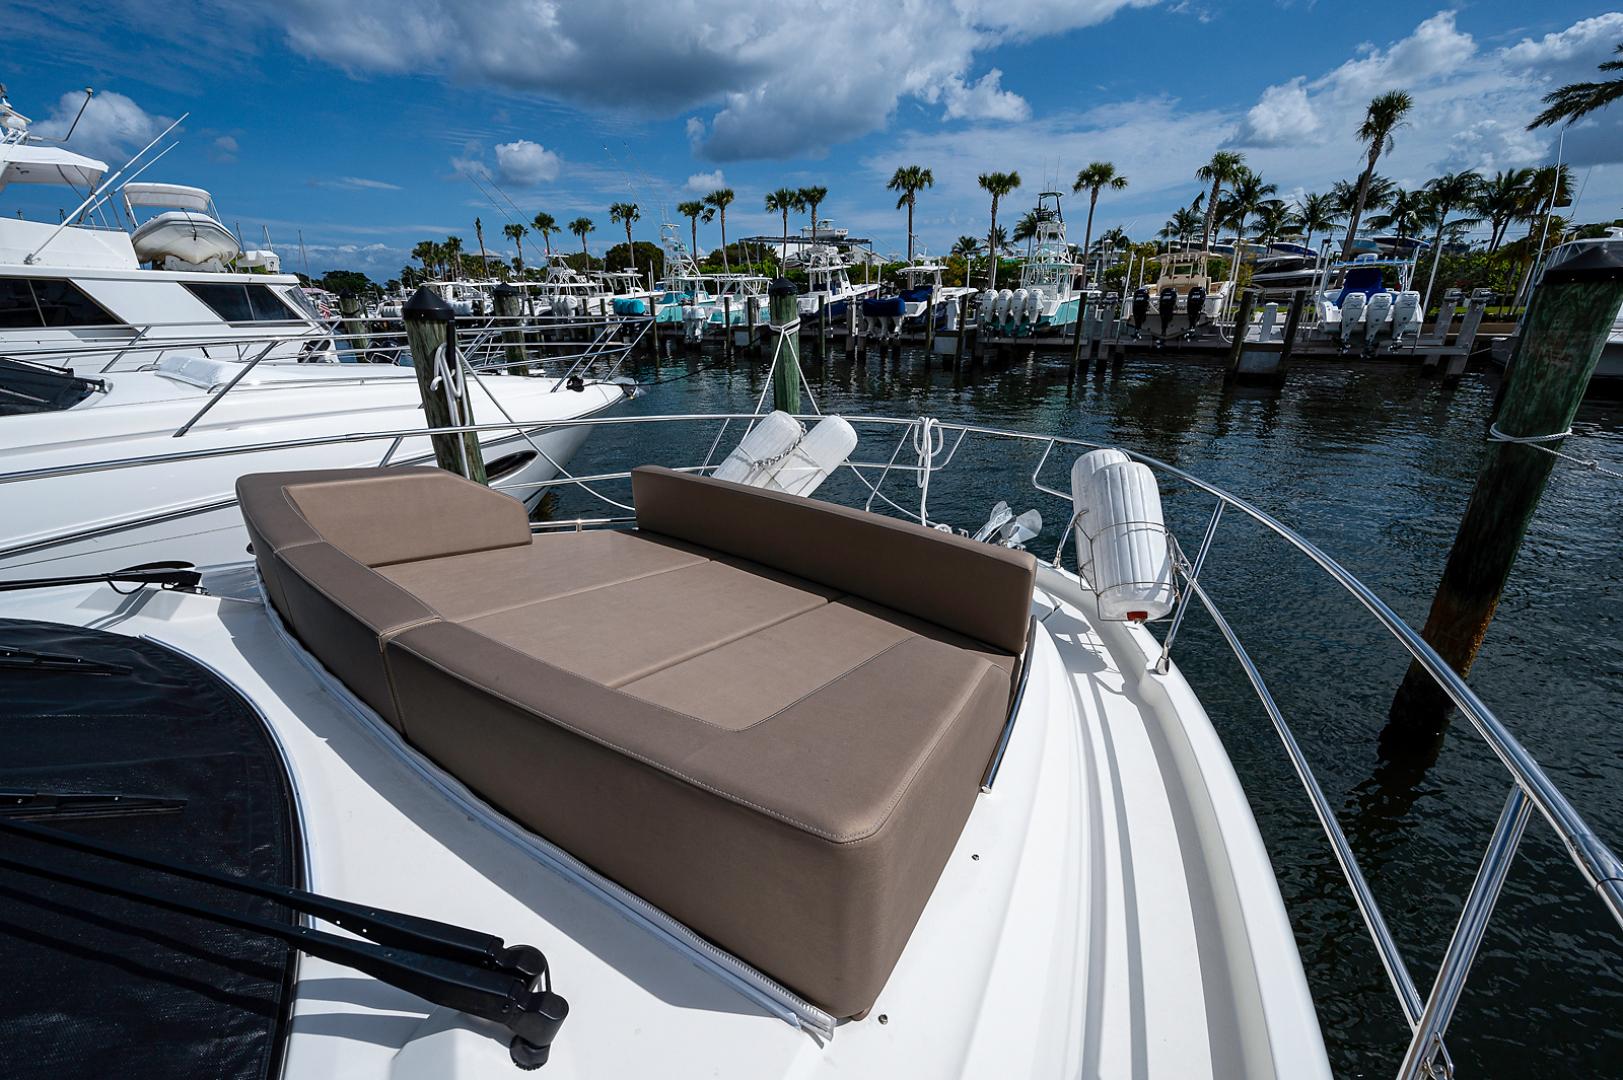 Prestige-460 Flybridge 2018-SEAQUEL Palm Beach Gardens-Florida-United States-Bow-1351147 | Thumbnail